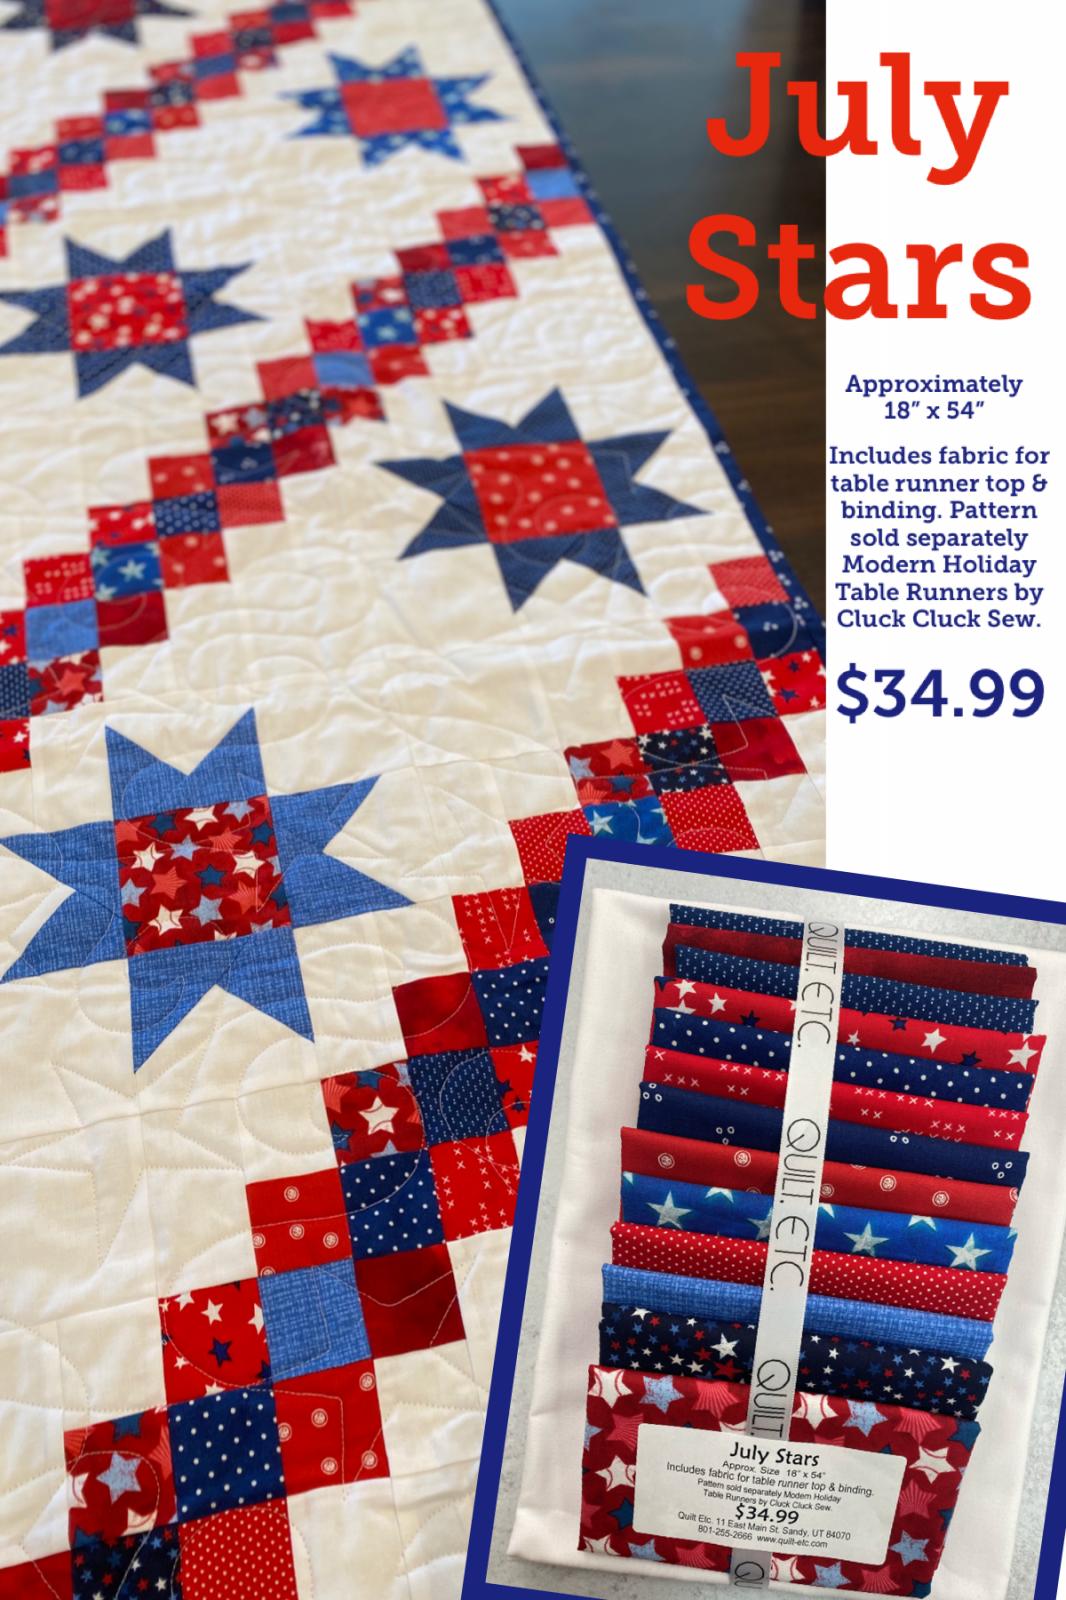 July Stars